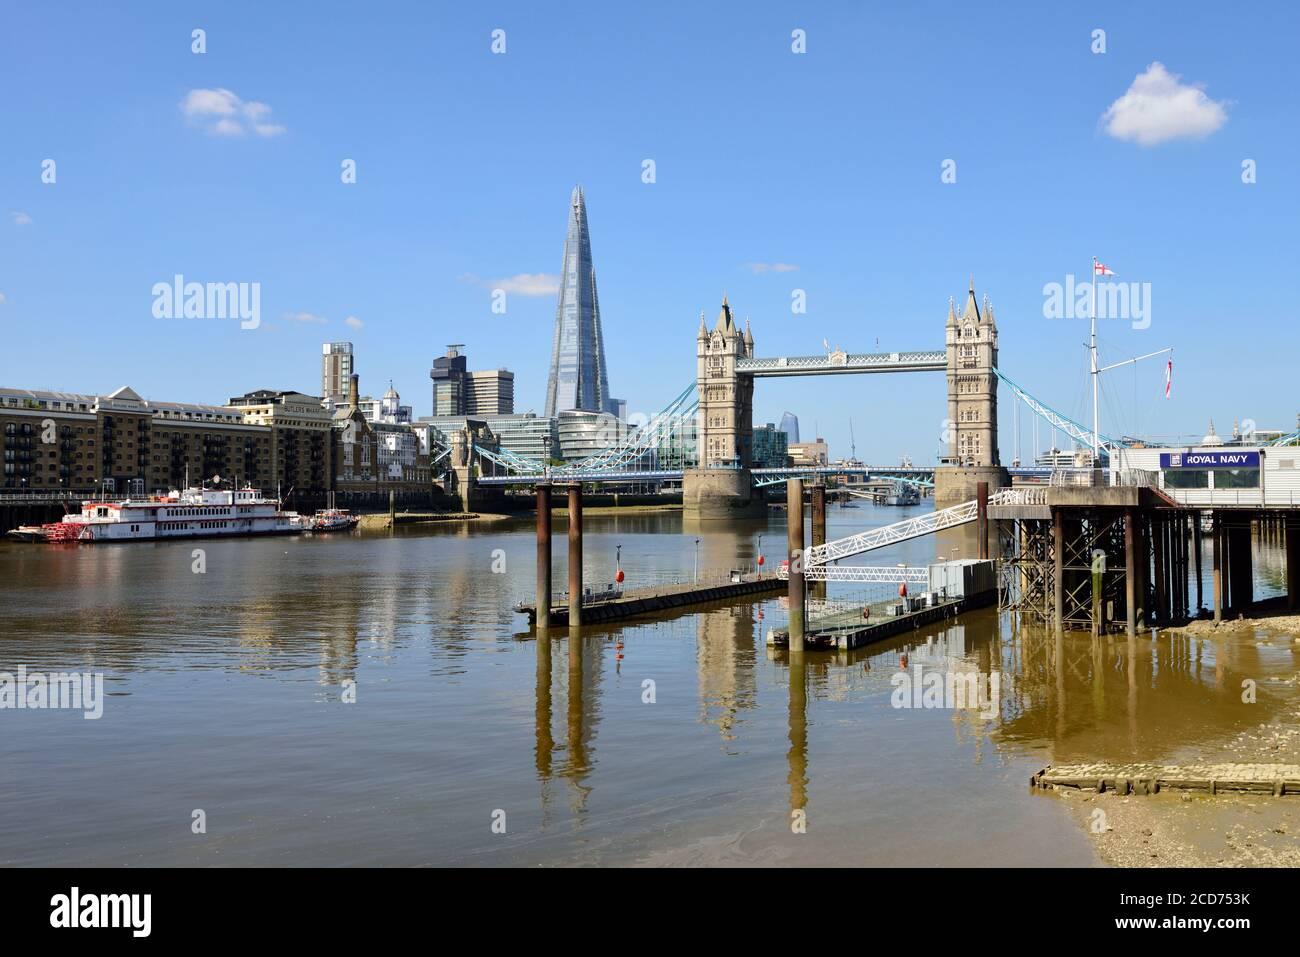 Pool of London, Tower Bridge, Shard of Glass and HMS President Naval Base, London, United Kingdom Stock Photo